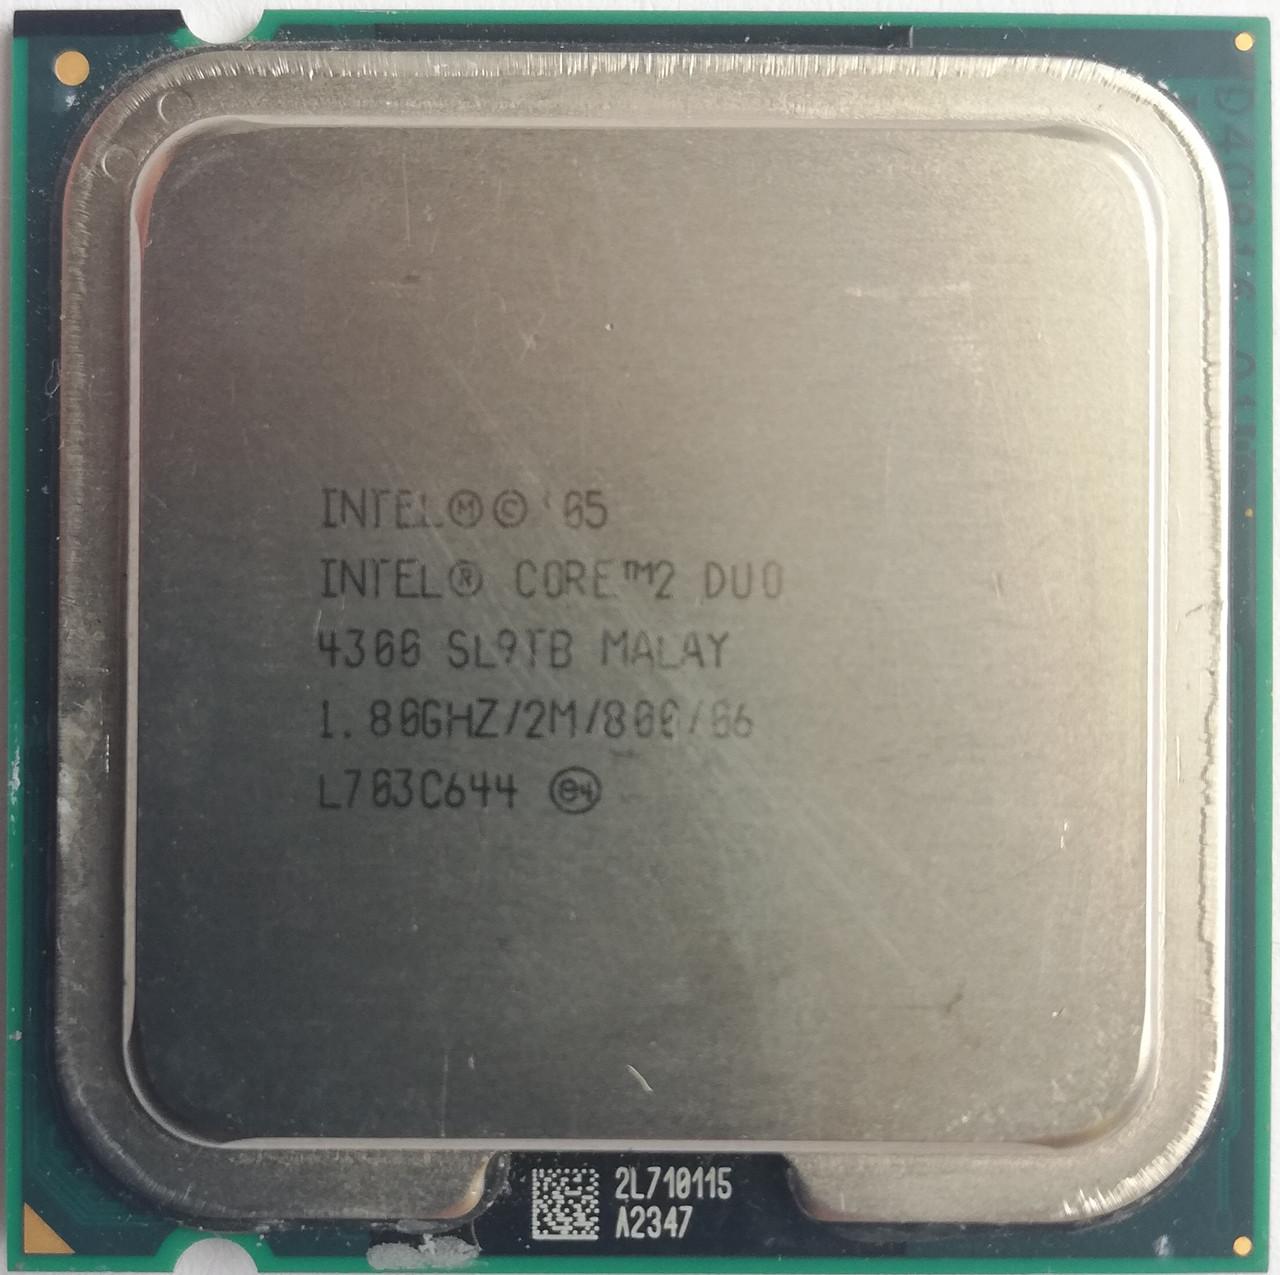 Процессор Intel Core 2 Duo E4300 L2 SL9TB 1.80GHz 2M Cache 800 MHz FSB Socket 775 Б/У